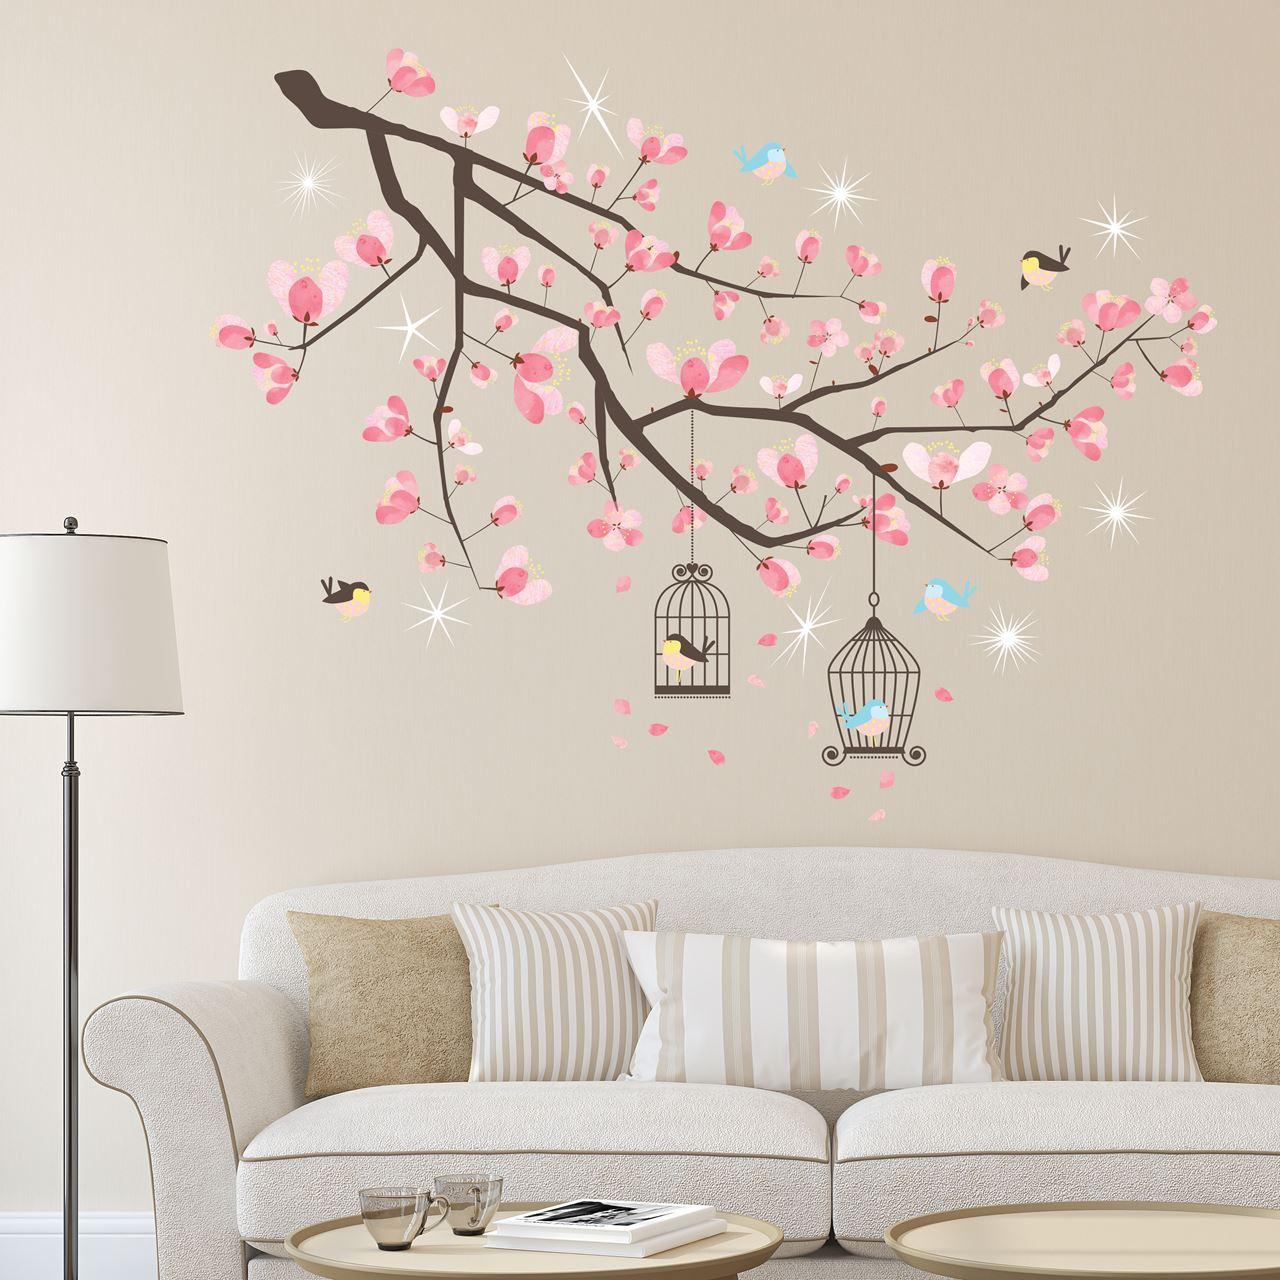 https://www.channeldistribution.nl/content/images/thumbs/002/0029161_walplus_walplus-decoratie-sticker-kristal-kersen-bloesem-boom-met-swarovski-kristallen_0780330743517_1.jpeg